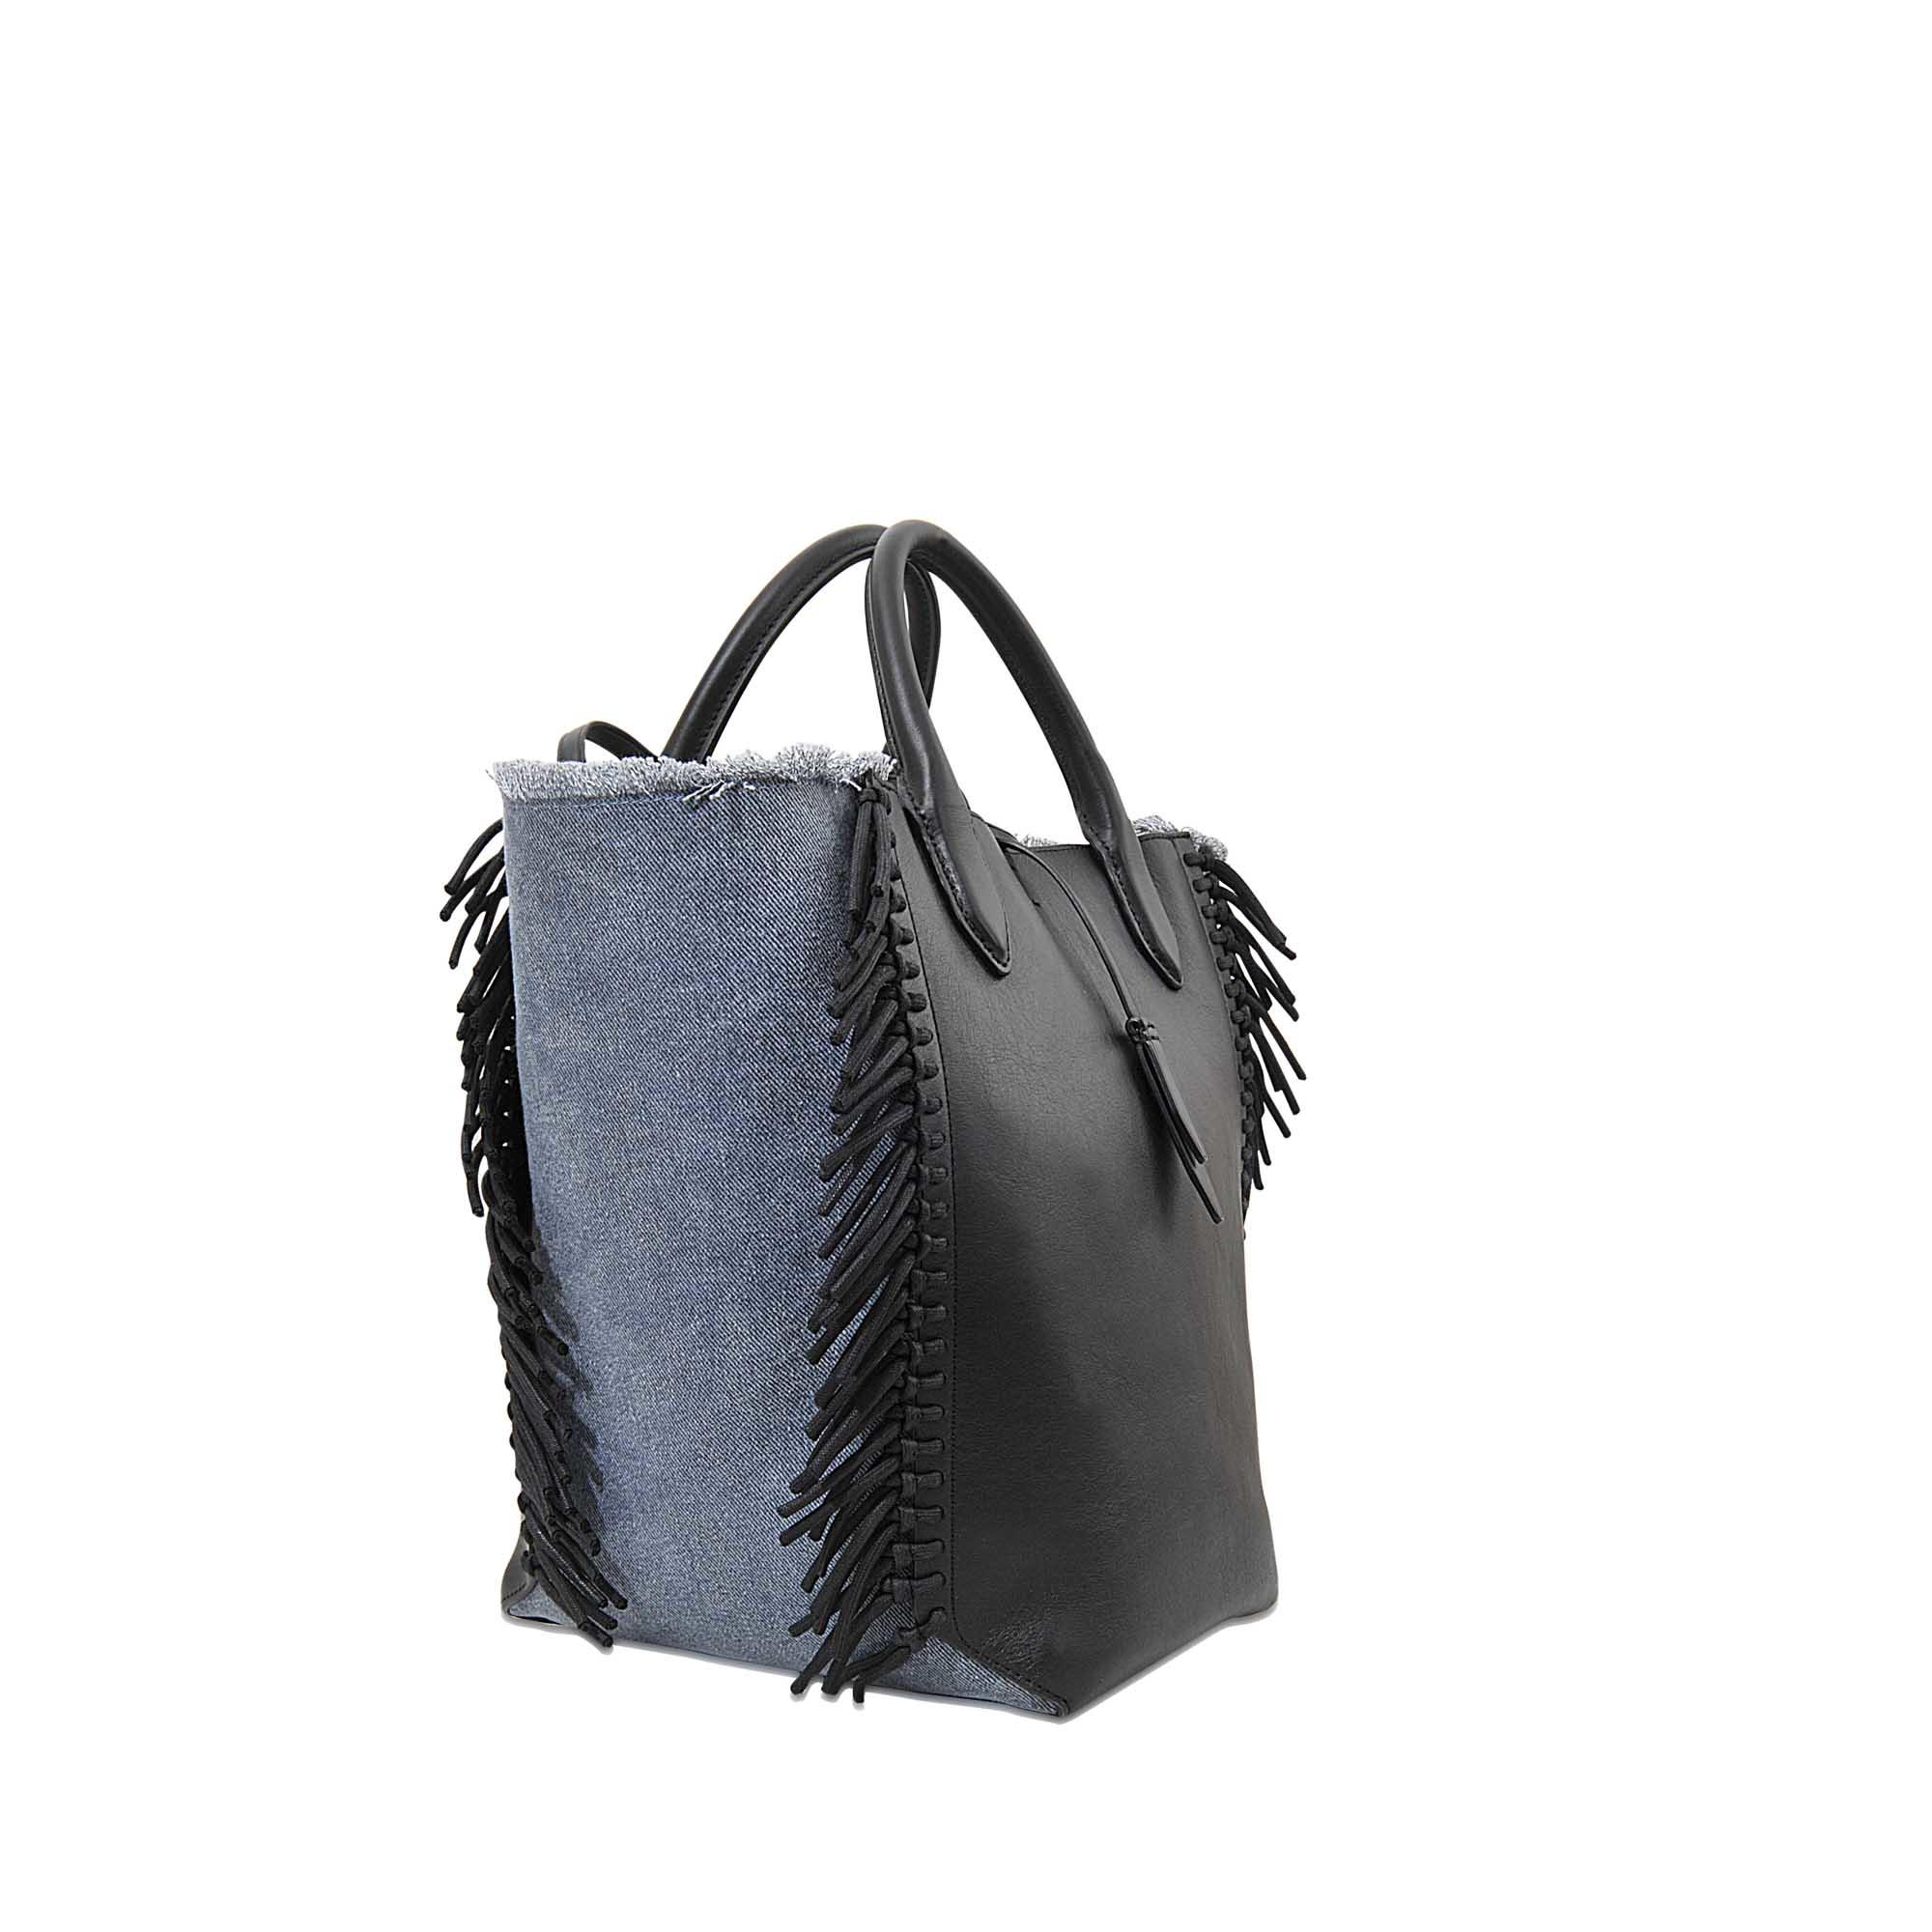 Brilliant 3 1 Phillip Lim Small Bianca Fringe Tote Bag In Black Lyst Short Hairstyles For Black Women Fulllsitofus